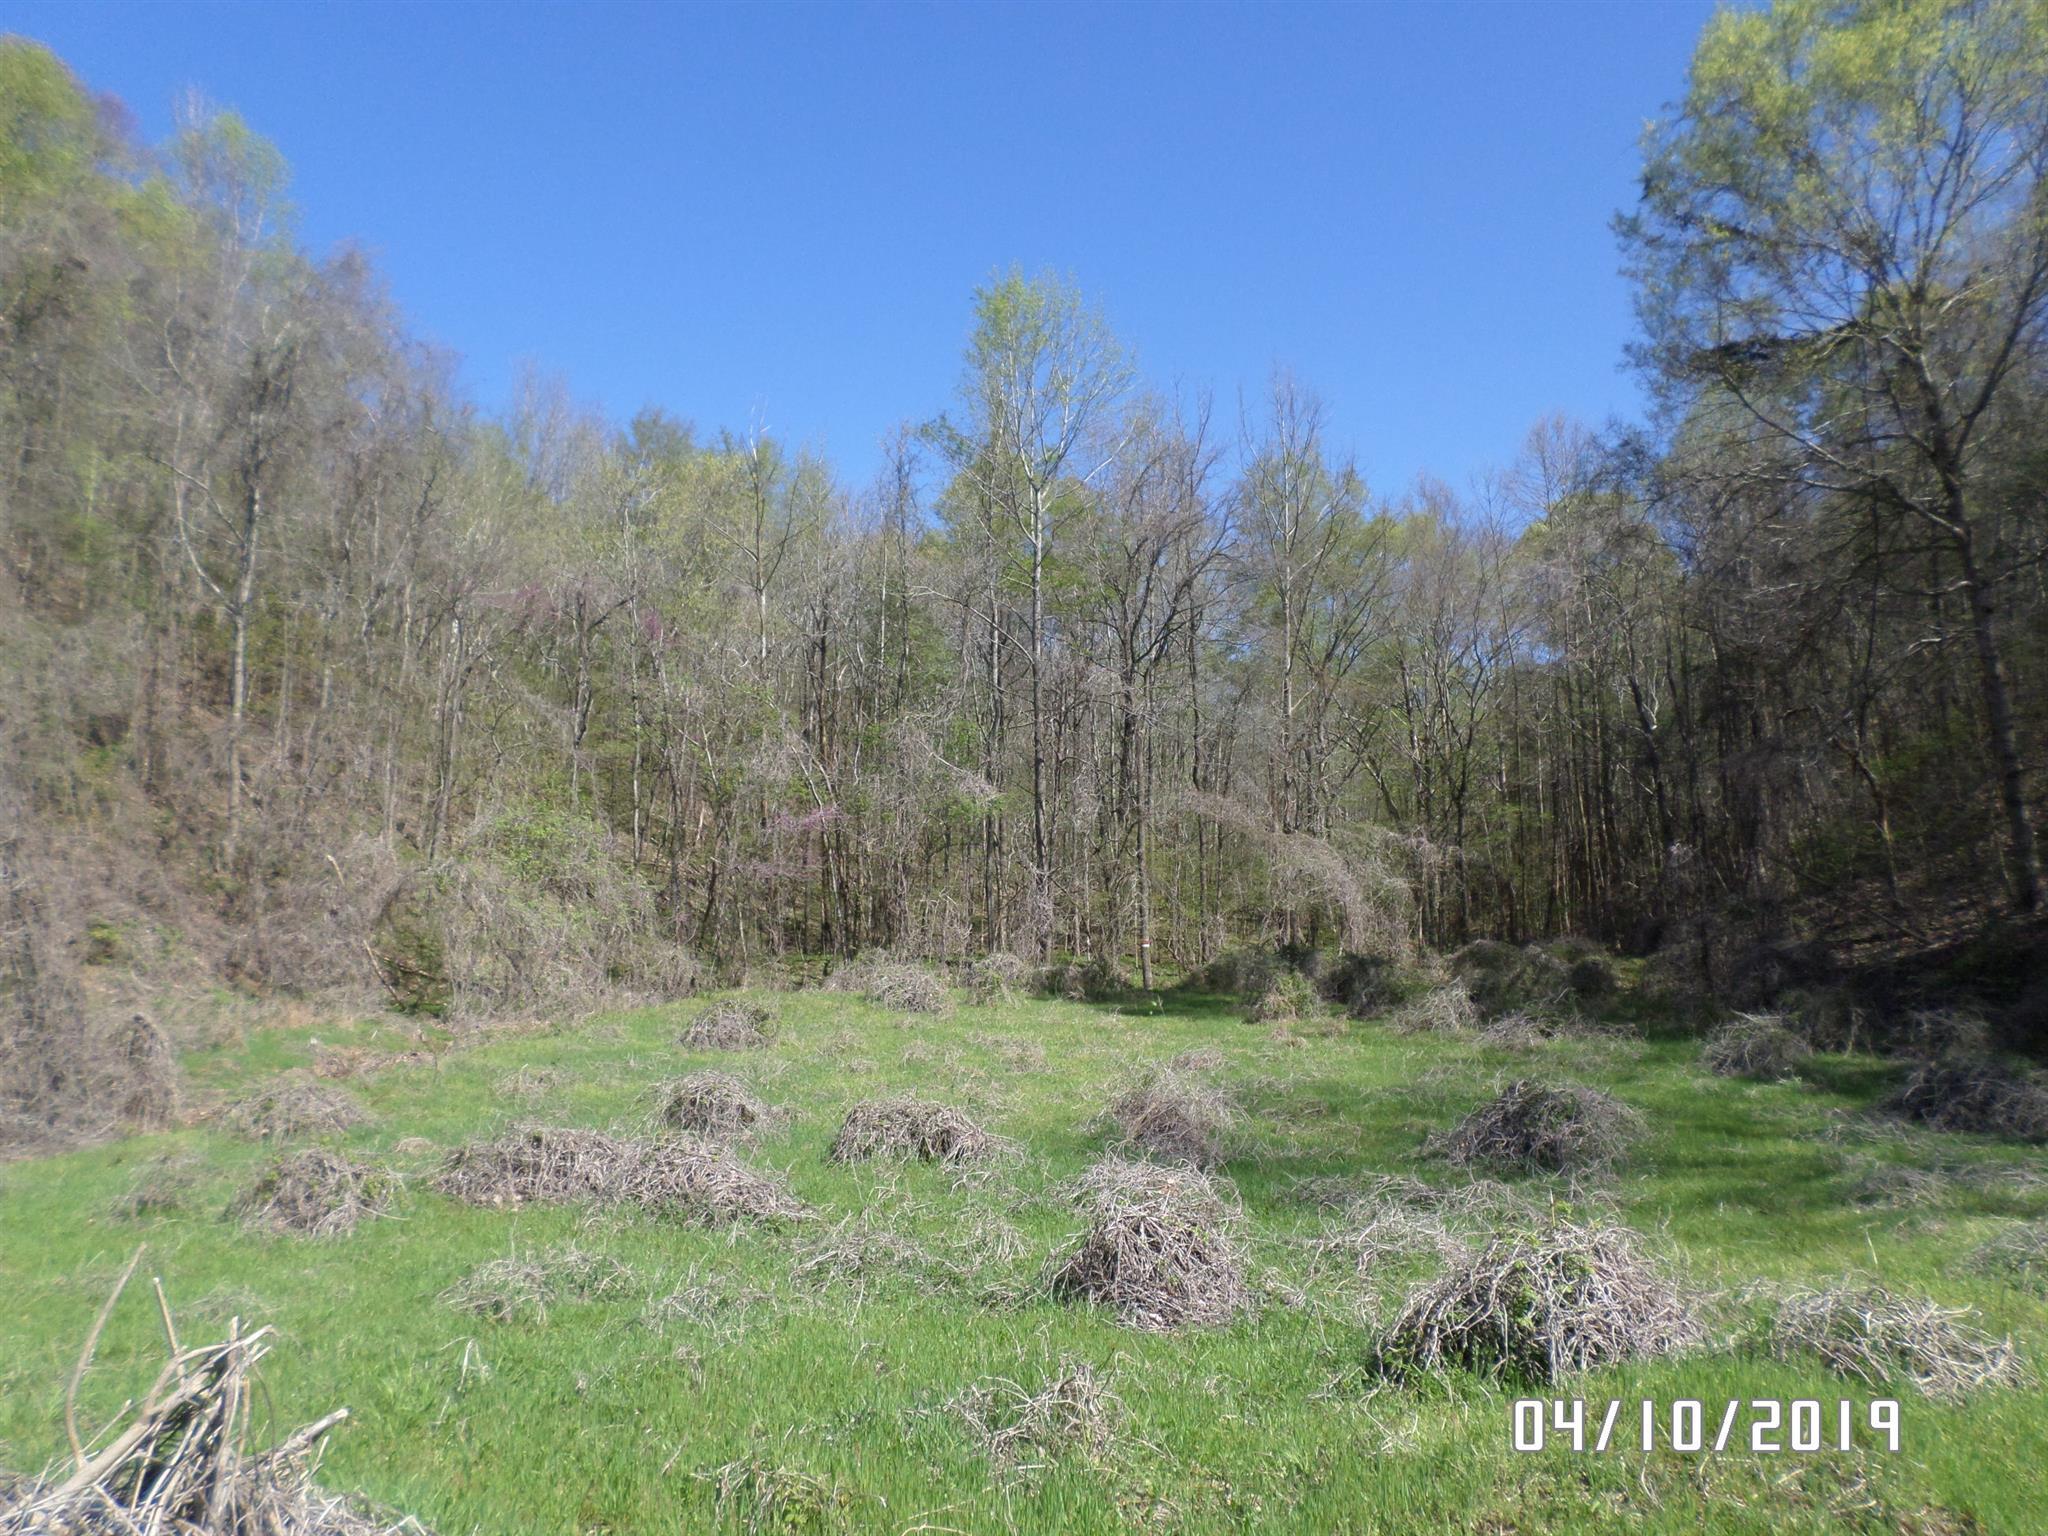 1888 Bear Creek Rd, Collinwood, TN 38450 - Collinwood, TN real estate listing